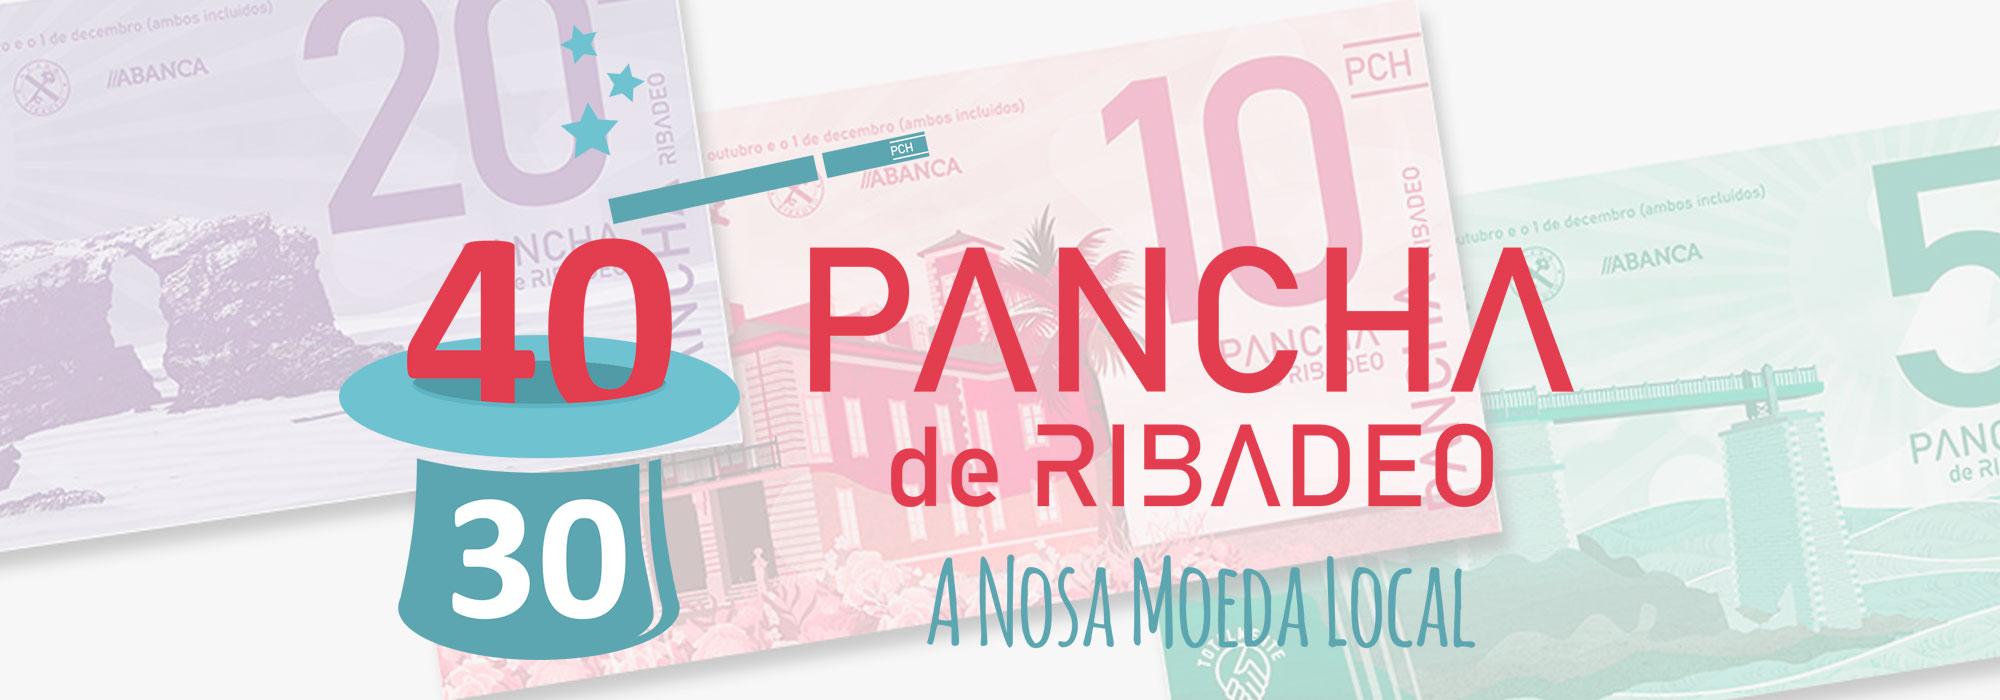 PANCHA moeda local